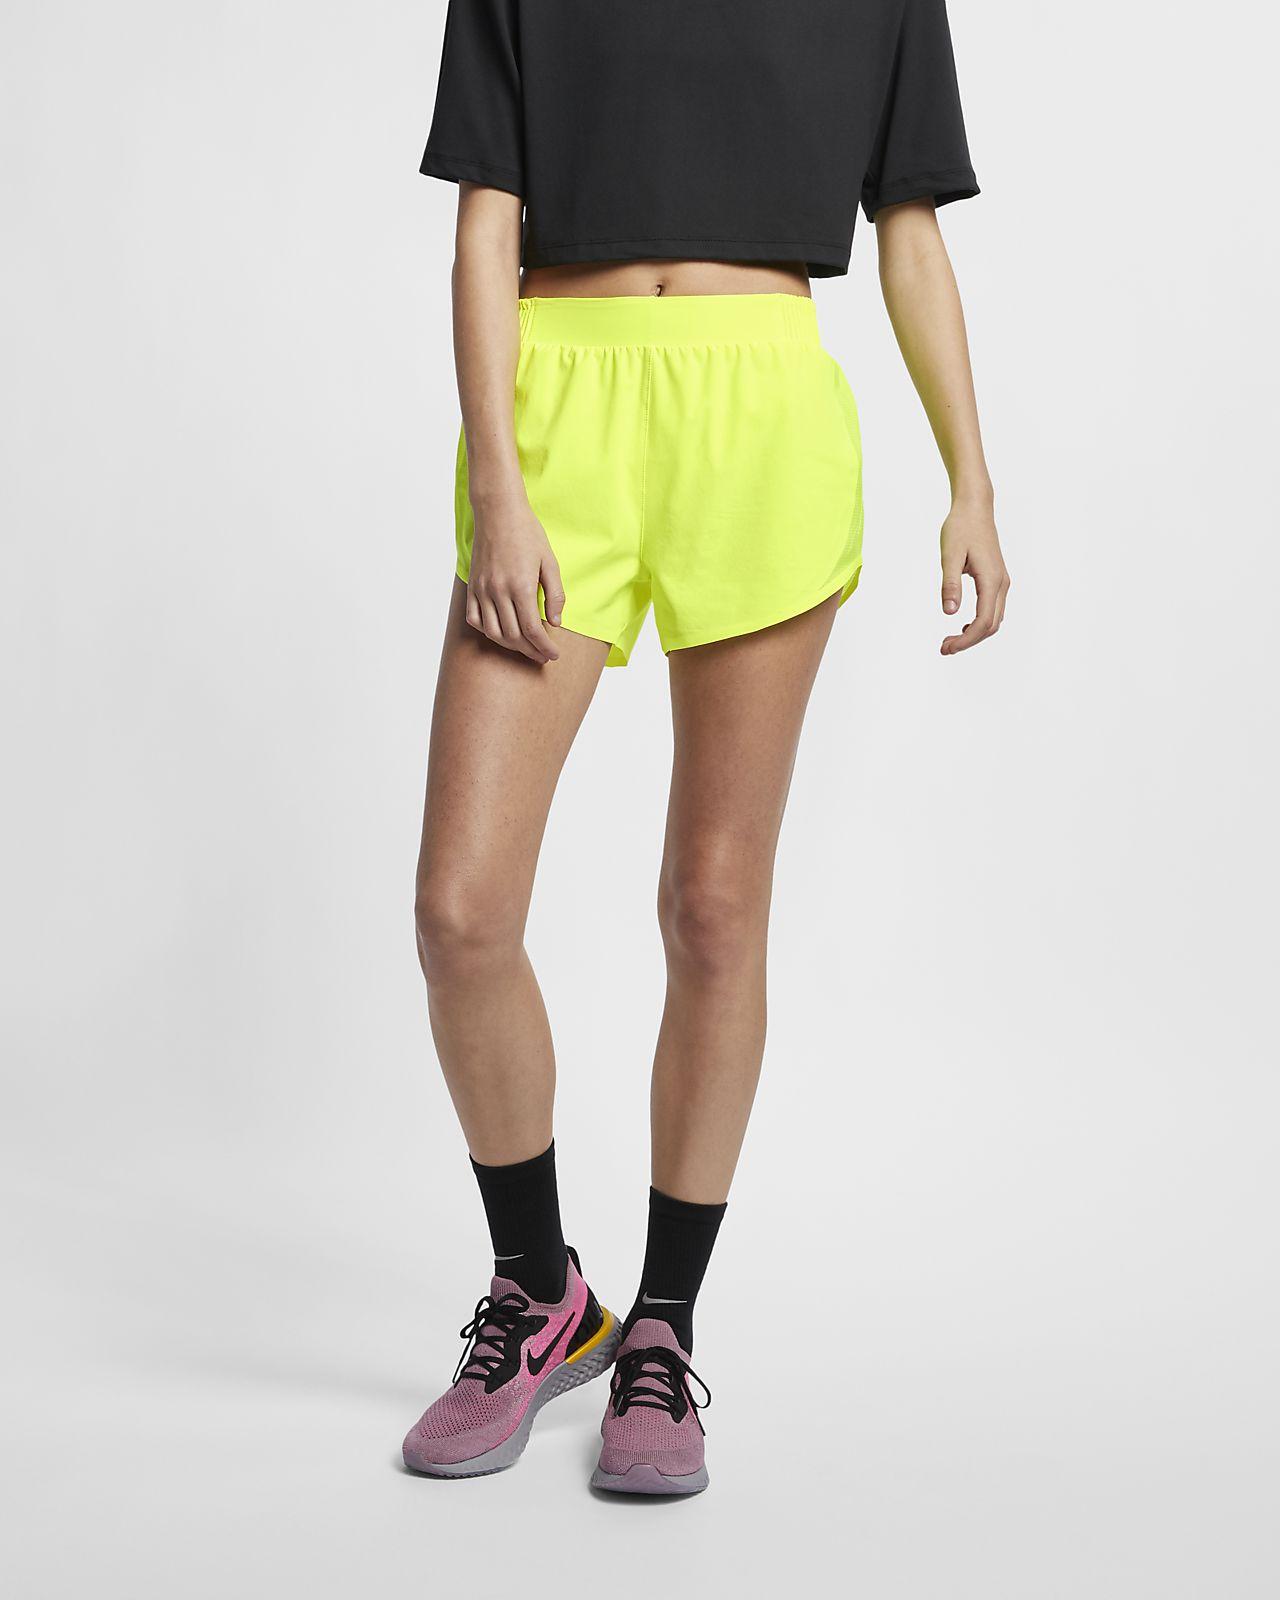 32755f2d3 Nike Tempo Women's Running Shorts. Nike.com SG